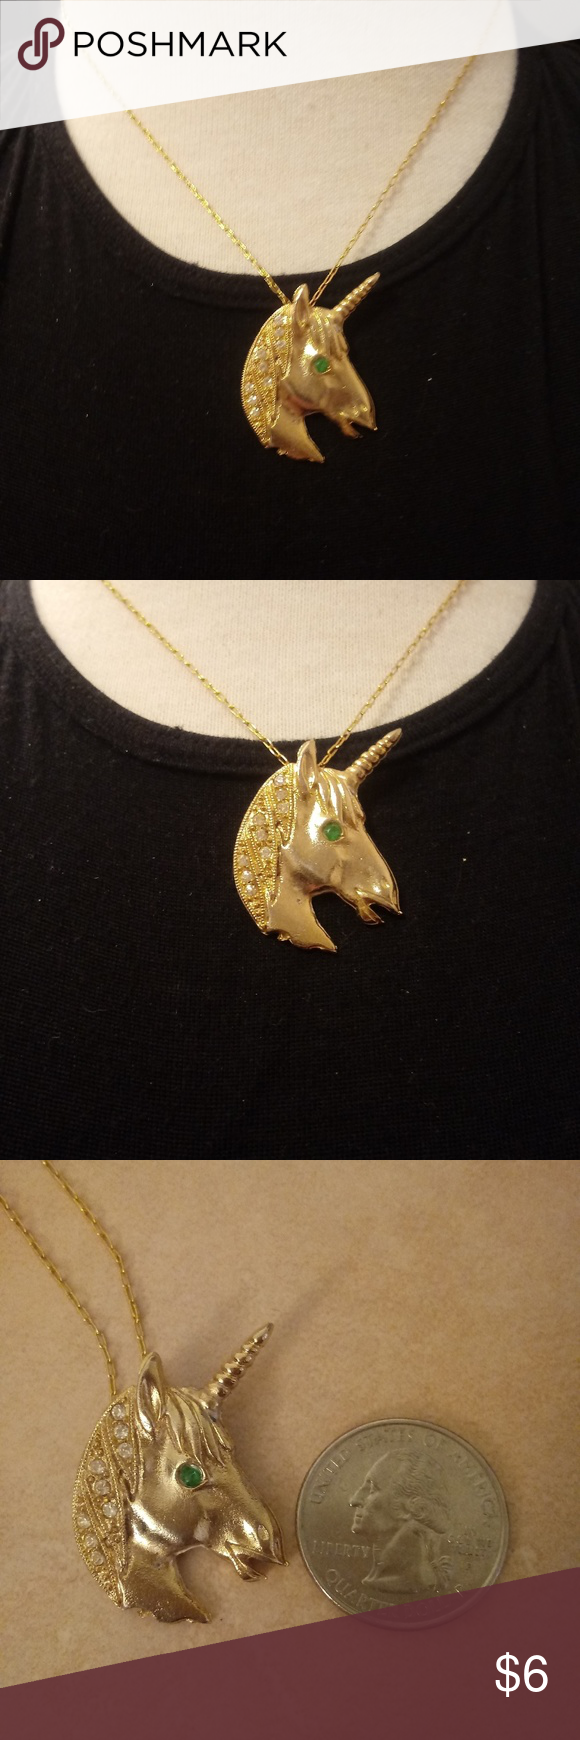 1 Gold Tone Unicorn Necklace Unicorn Necklace Necklace Blue Crystals